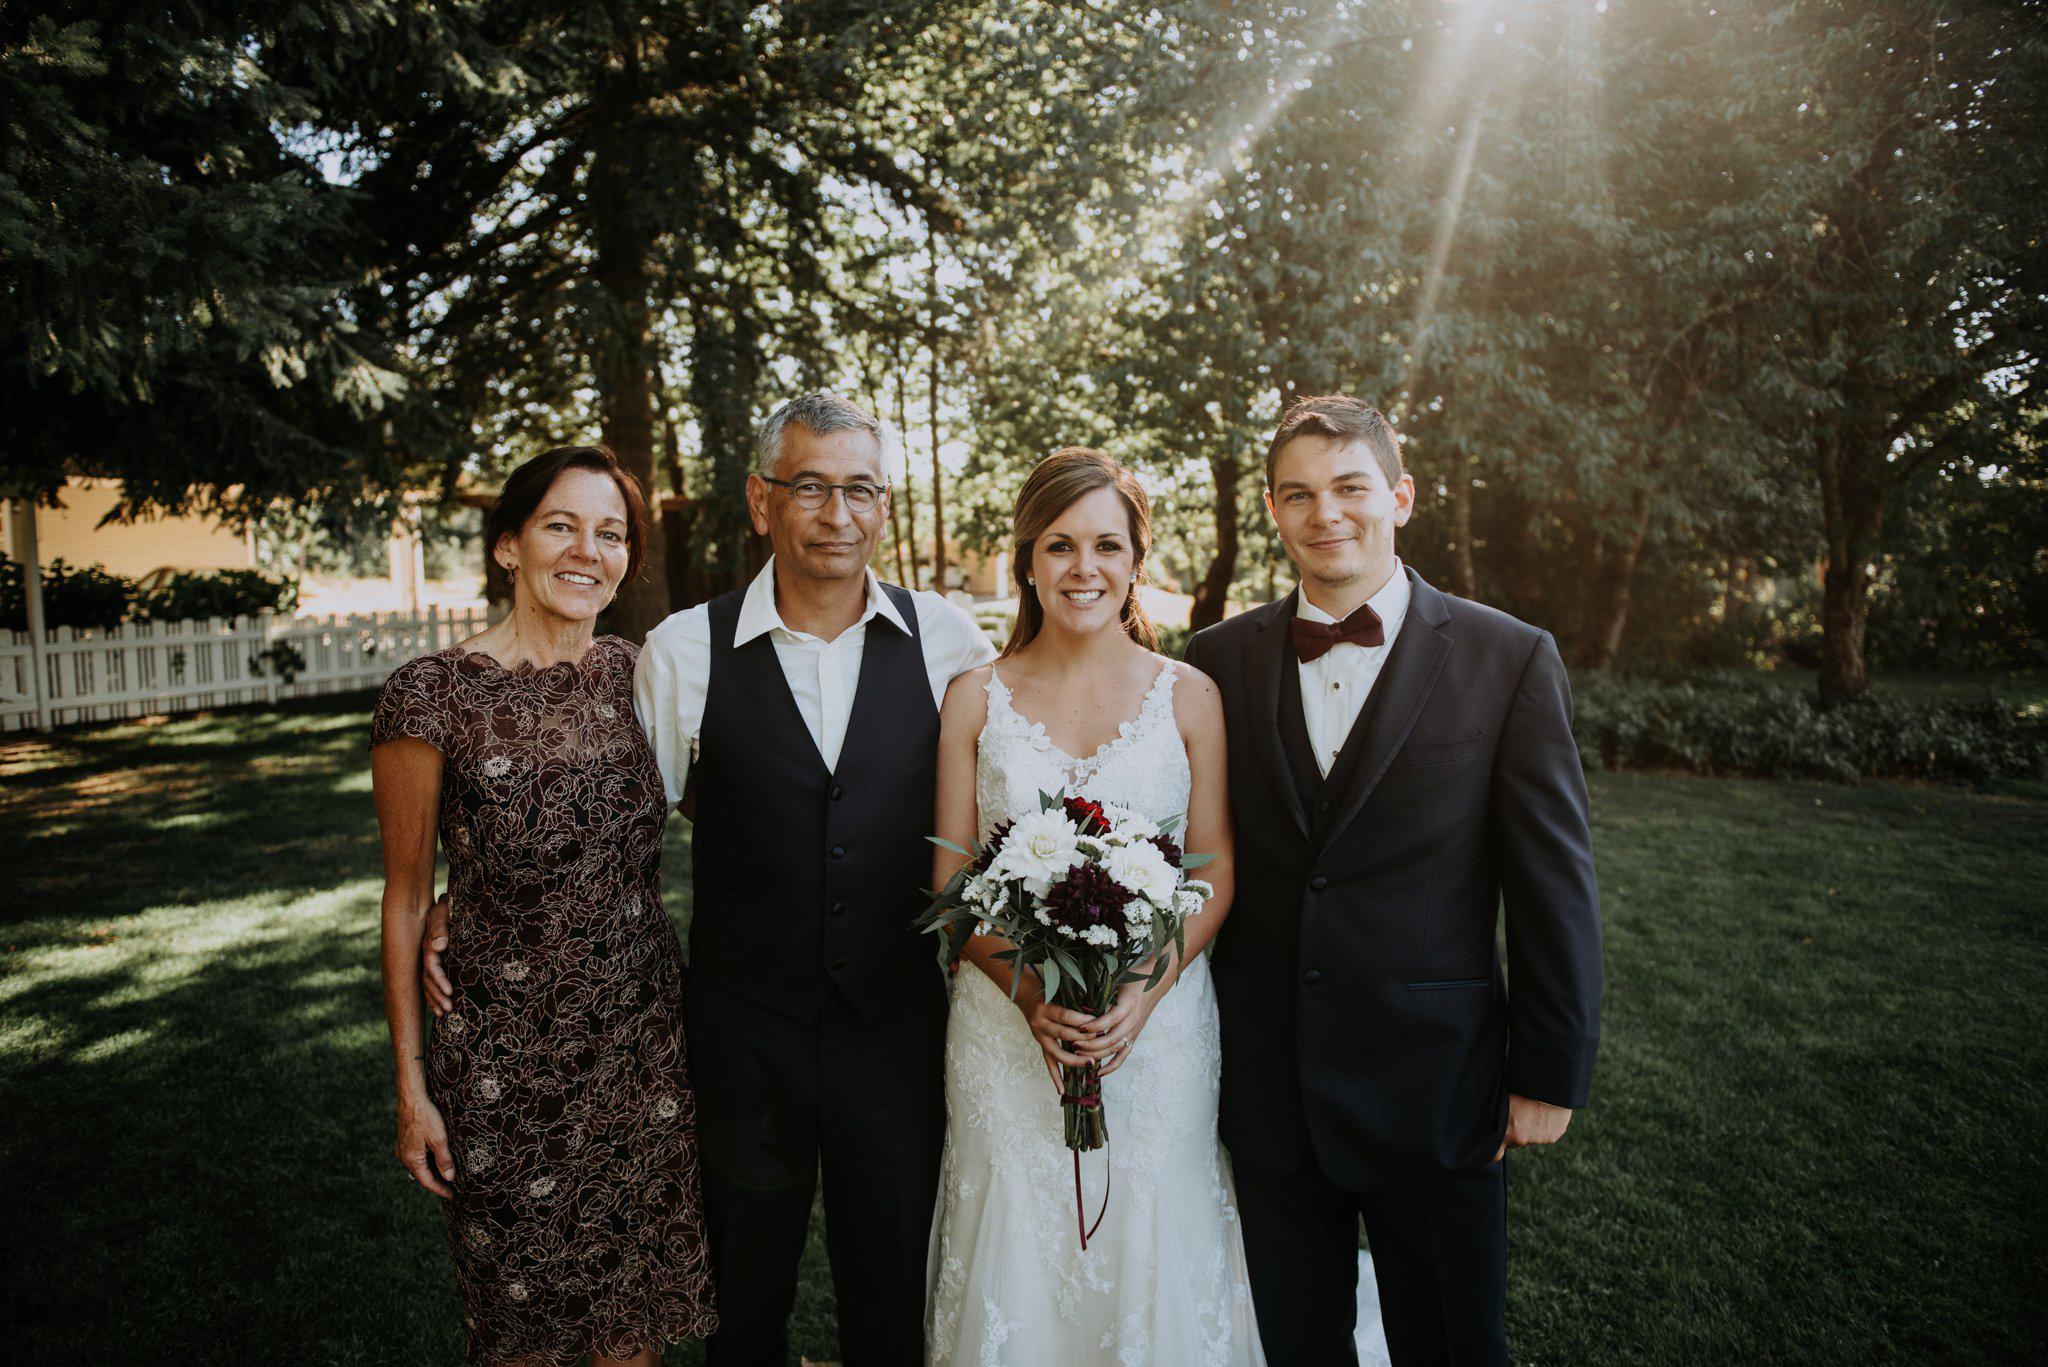 kristen-and-cody-the-kelley-farm-wedding-seattle-photographer-caitlyn-nikula-68.jpg